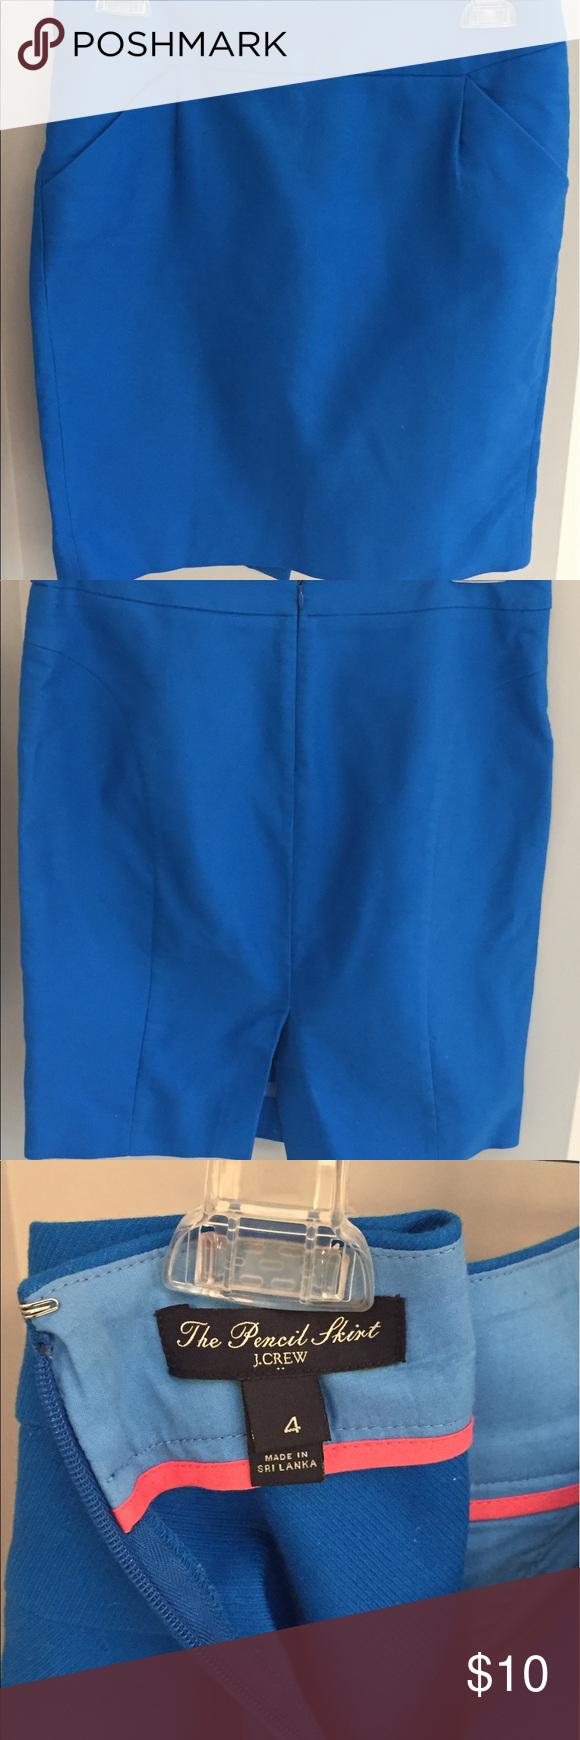 JCrew blue pencil skirt Size 4 blue pencil skirt. JCrew runs a little big so would probably fit a size 6 also. J. Crew Skirts Pencil